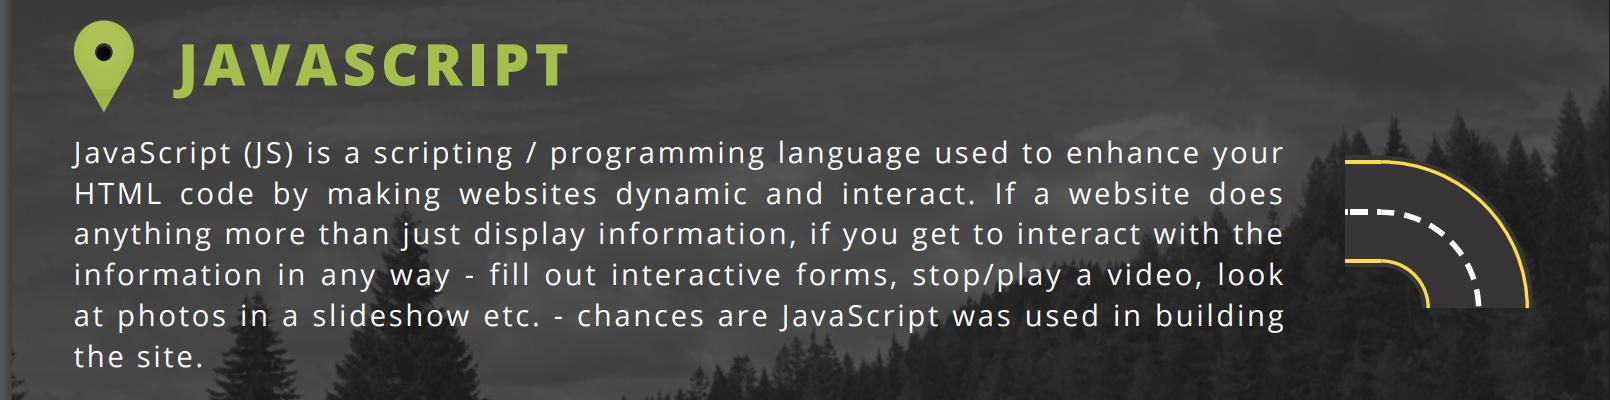 JS excerpt from roadmap